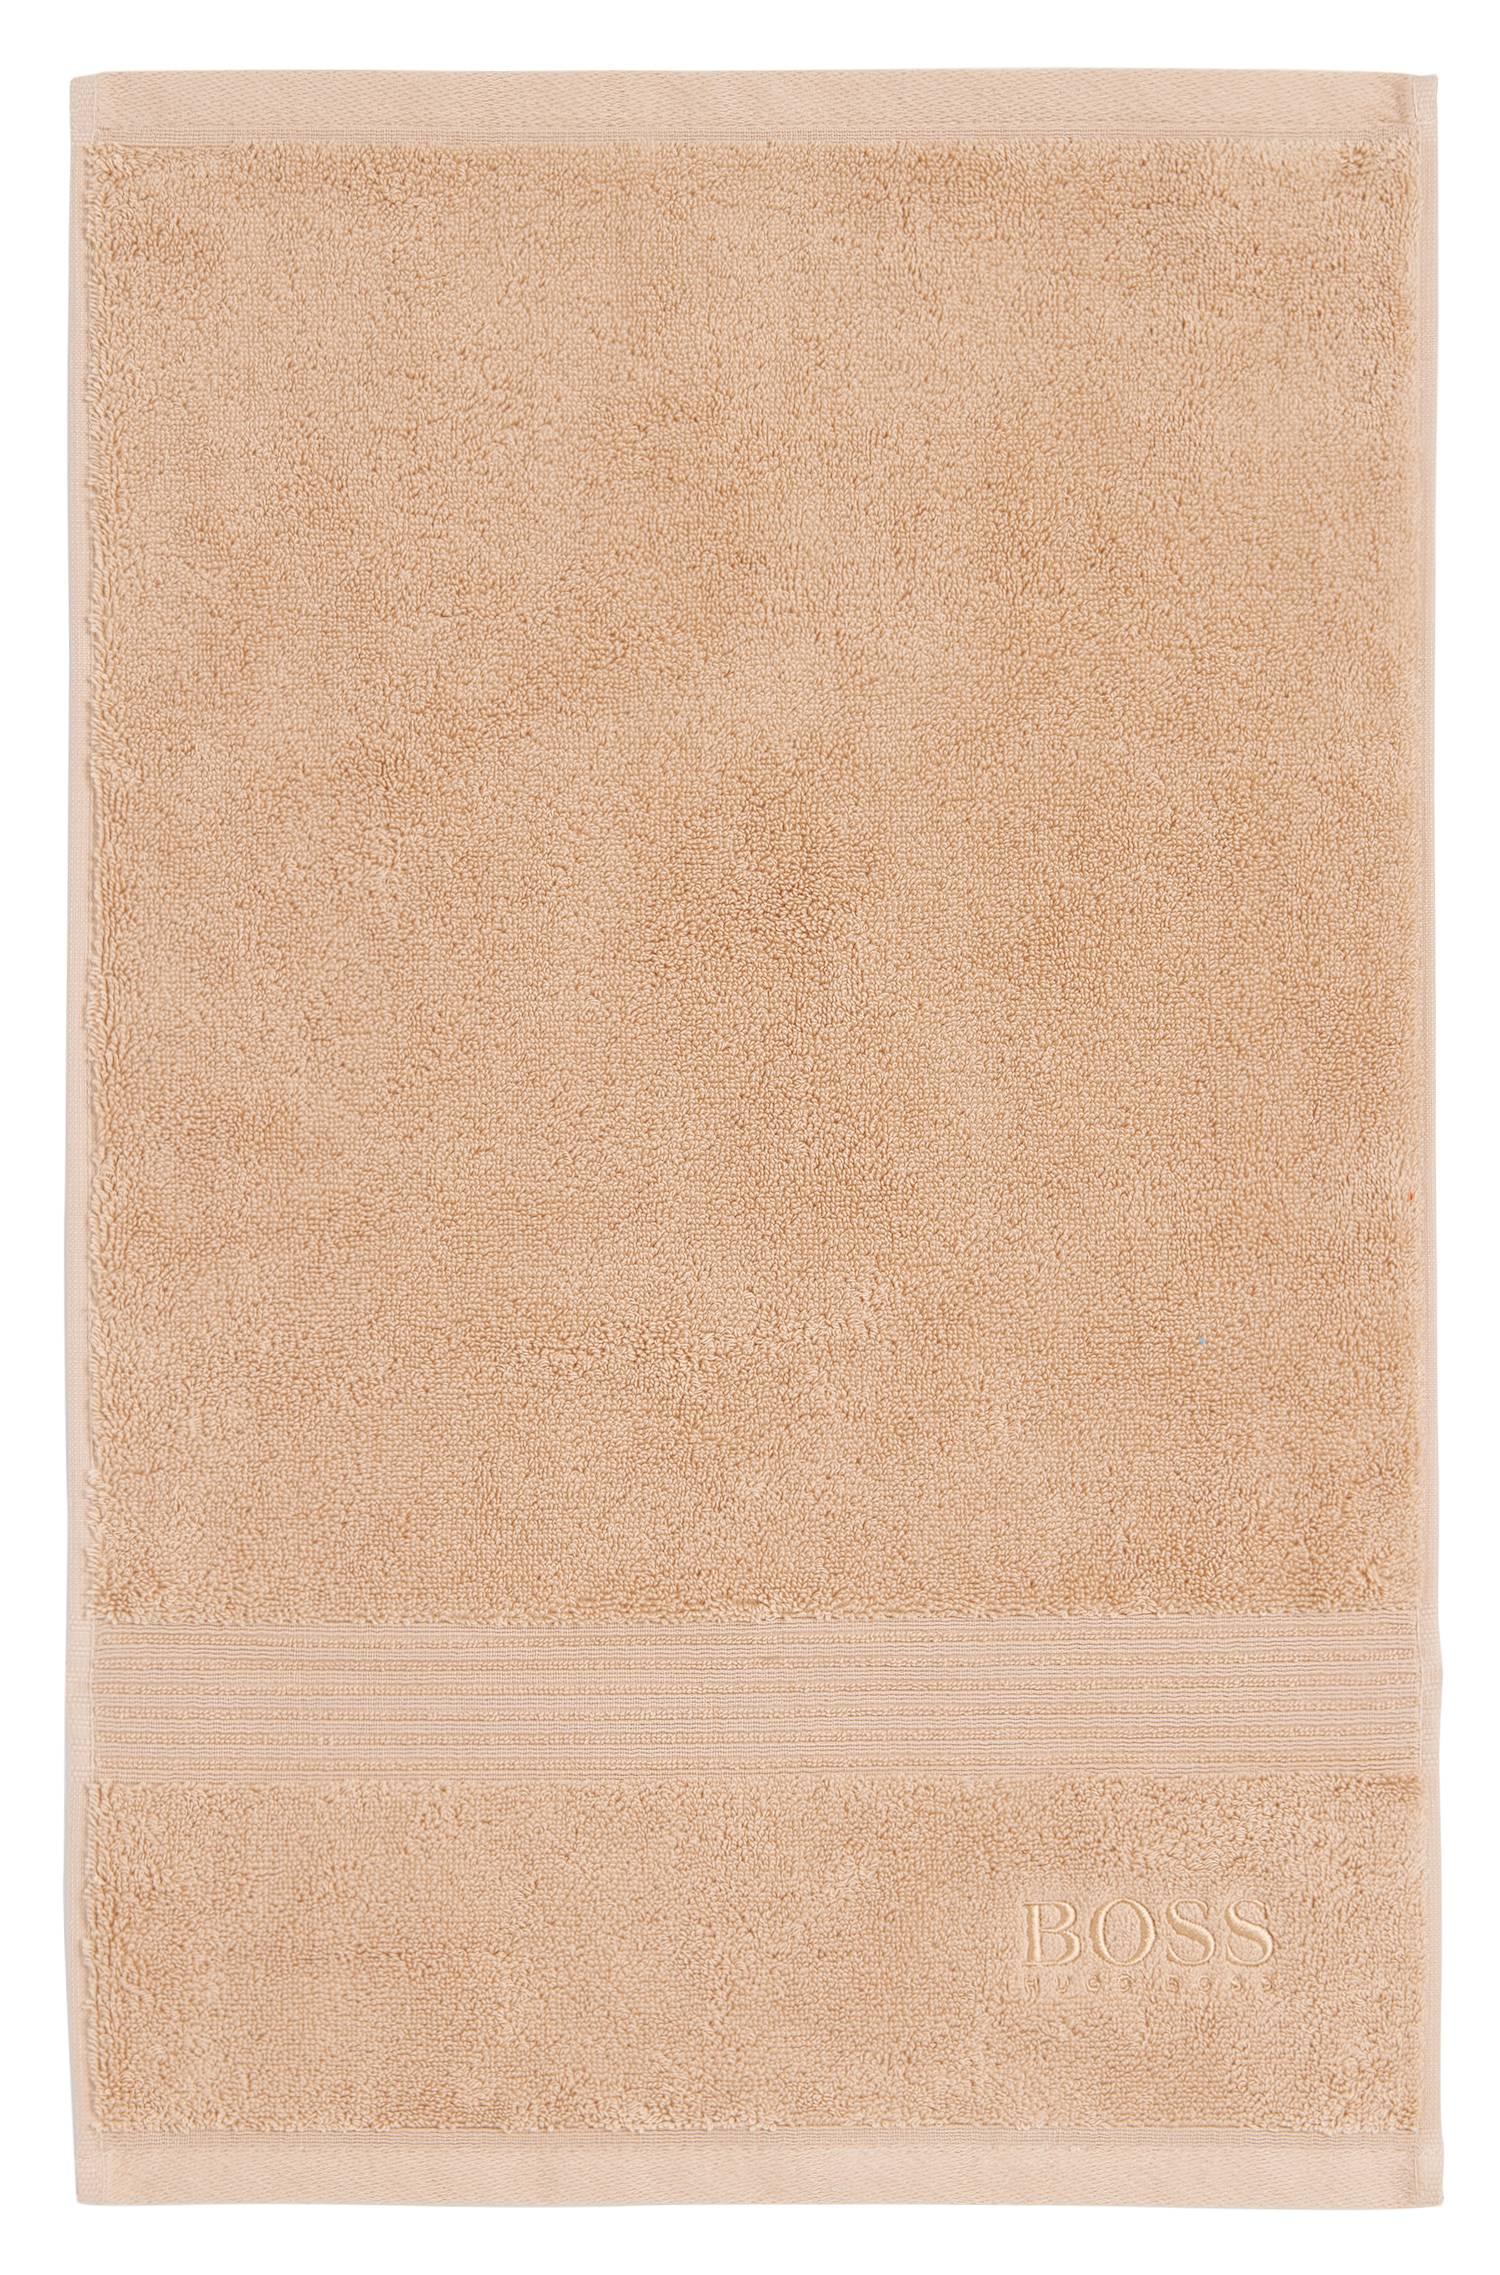 Guest towel `LOFT Invite` in cotton terry